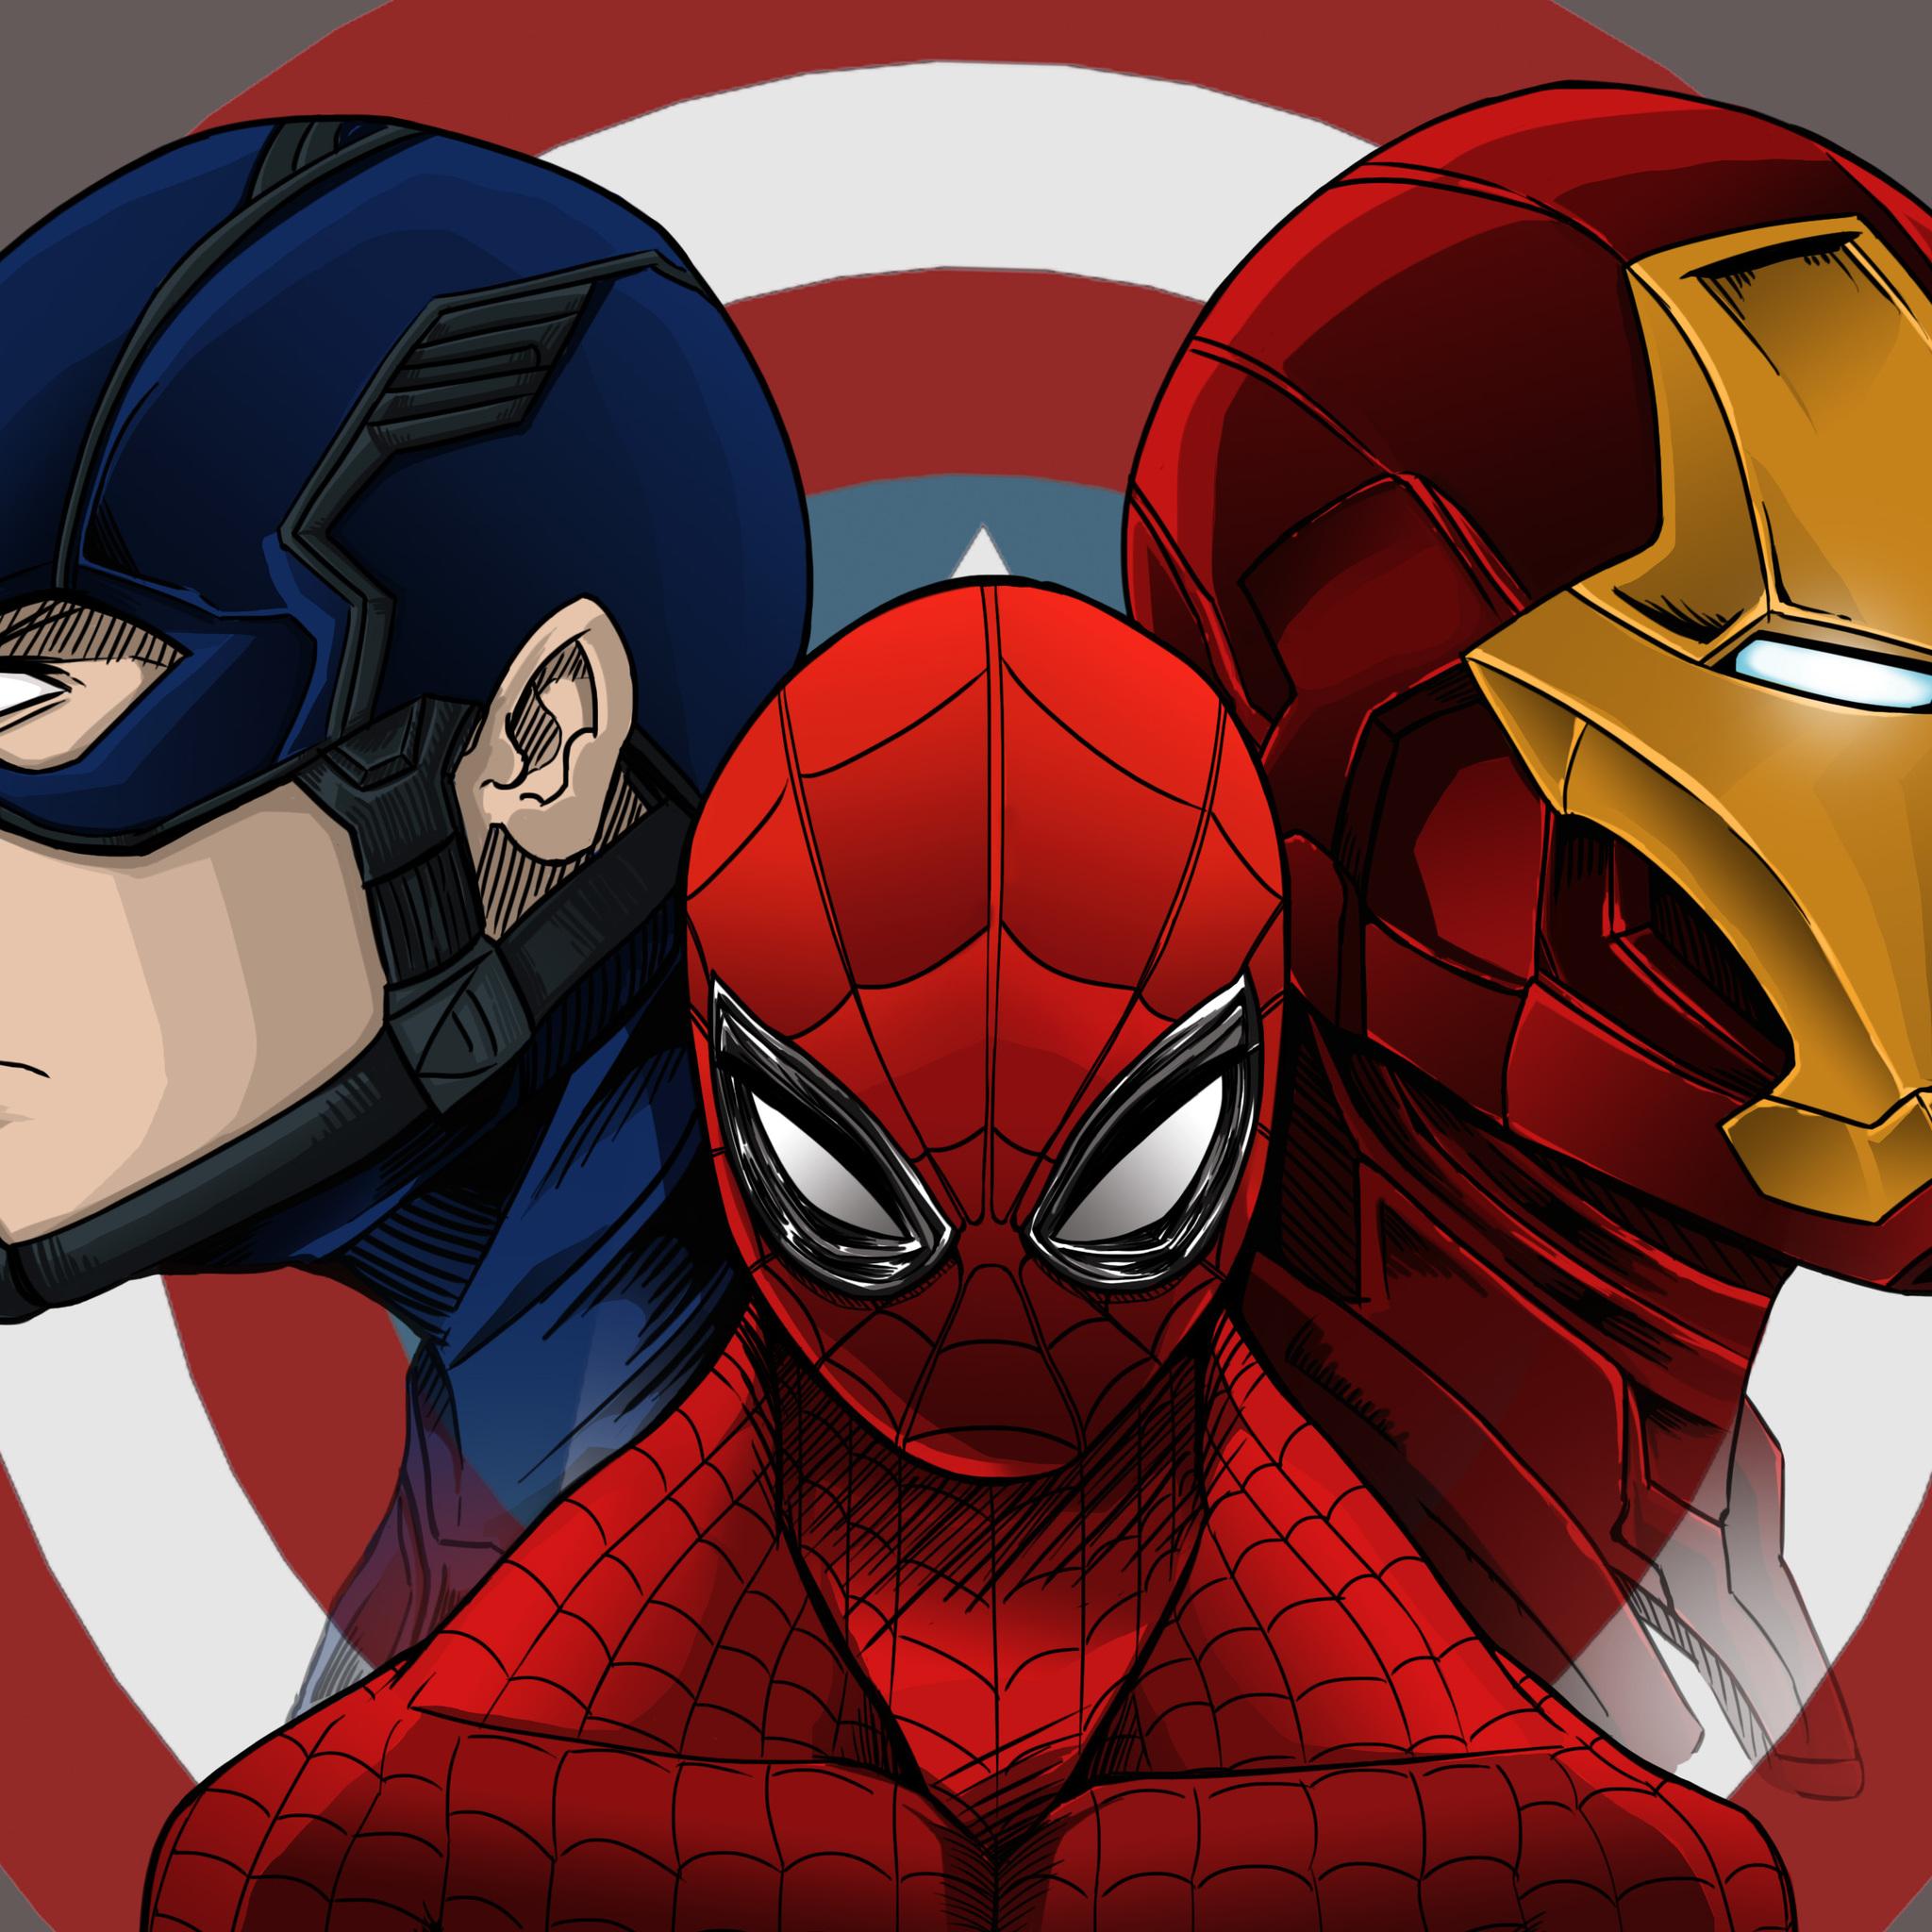 spiderman-iron-man-captain-america-artwork-k0.jpg